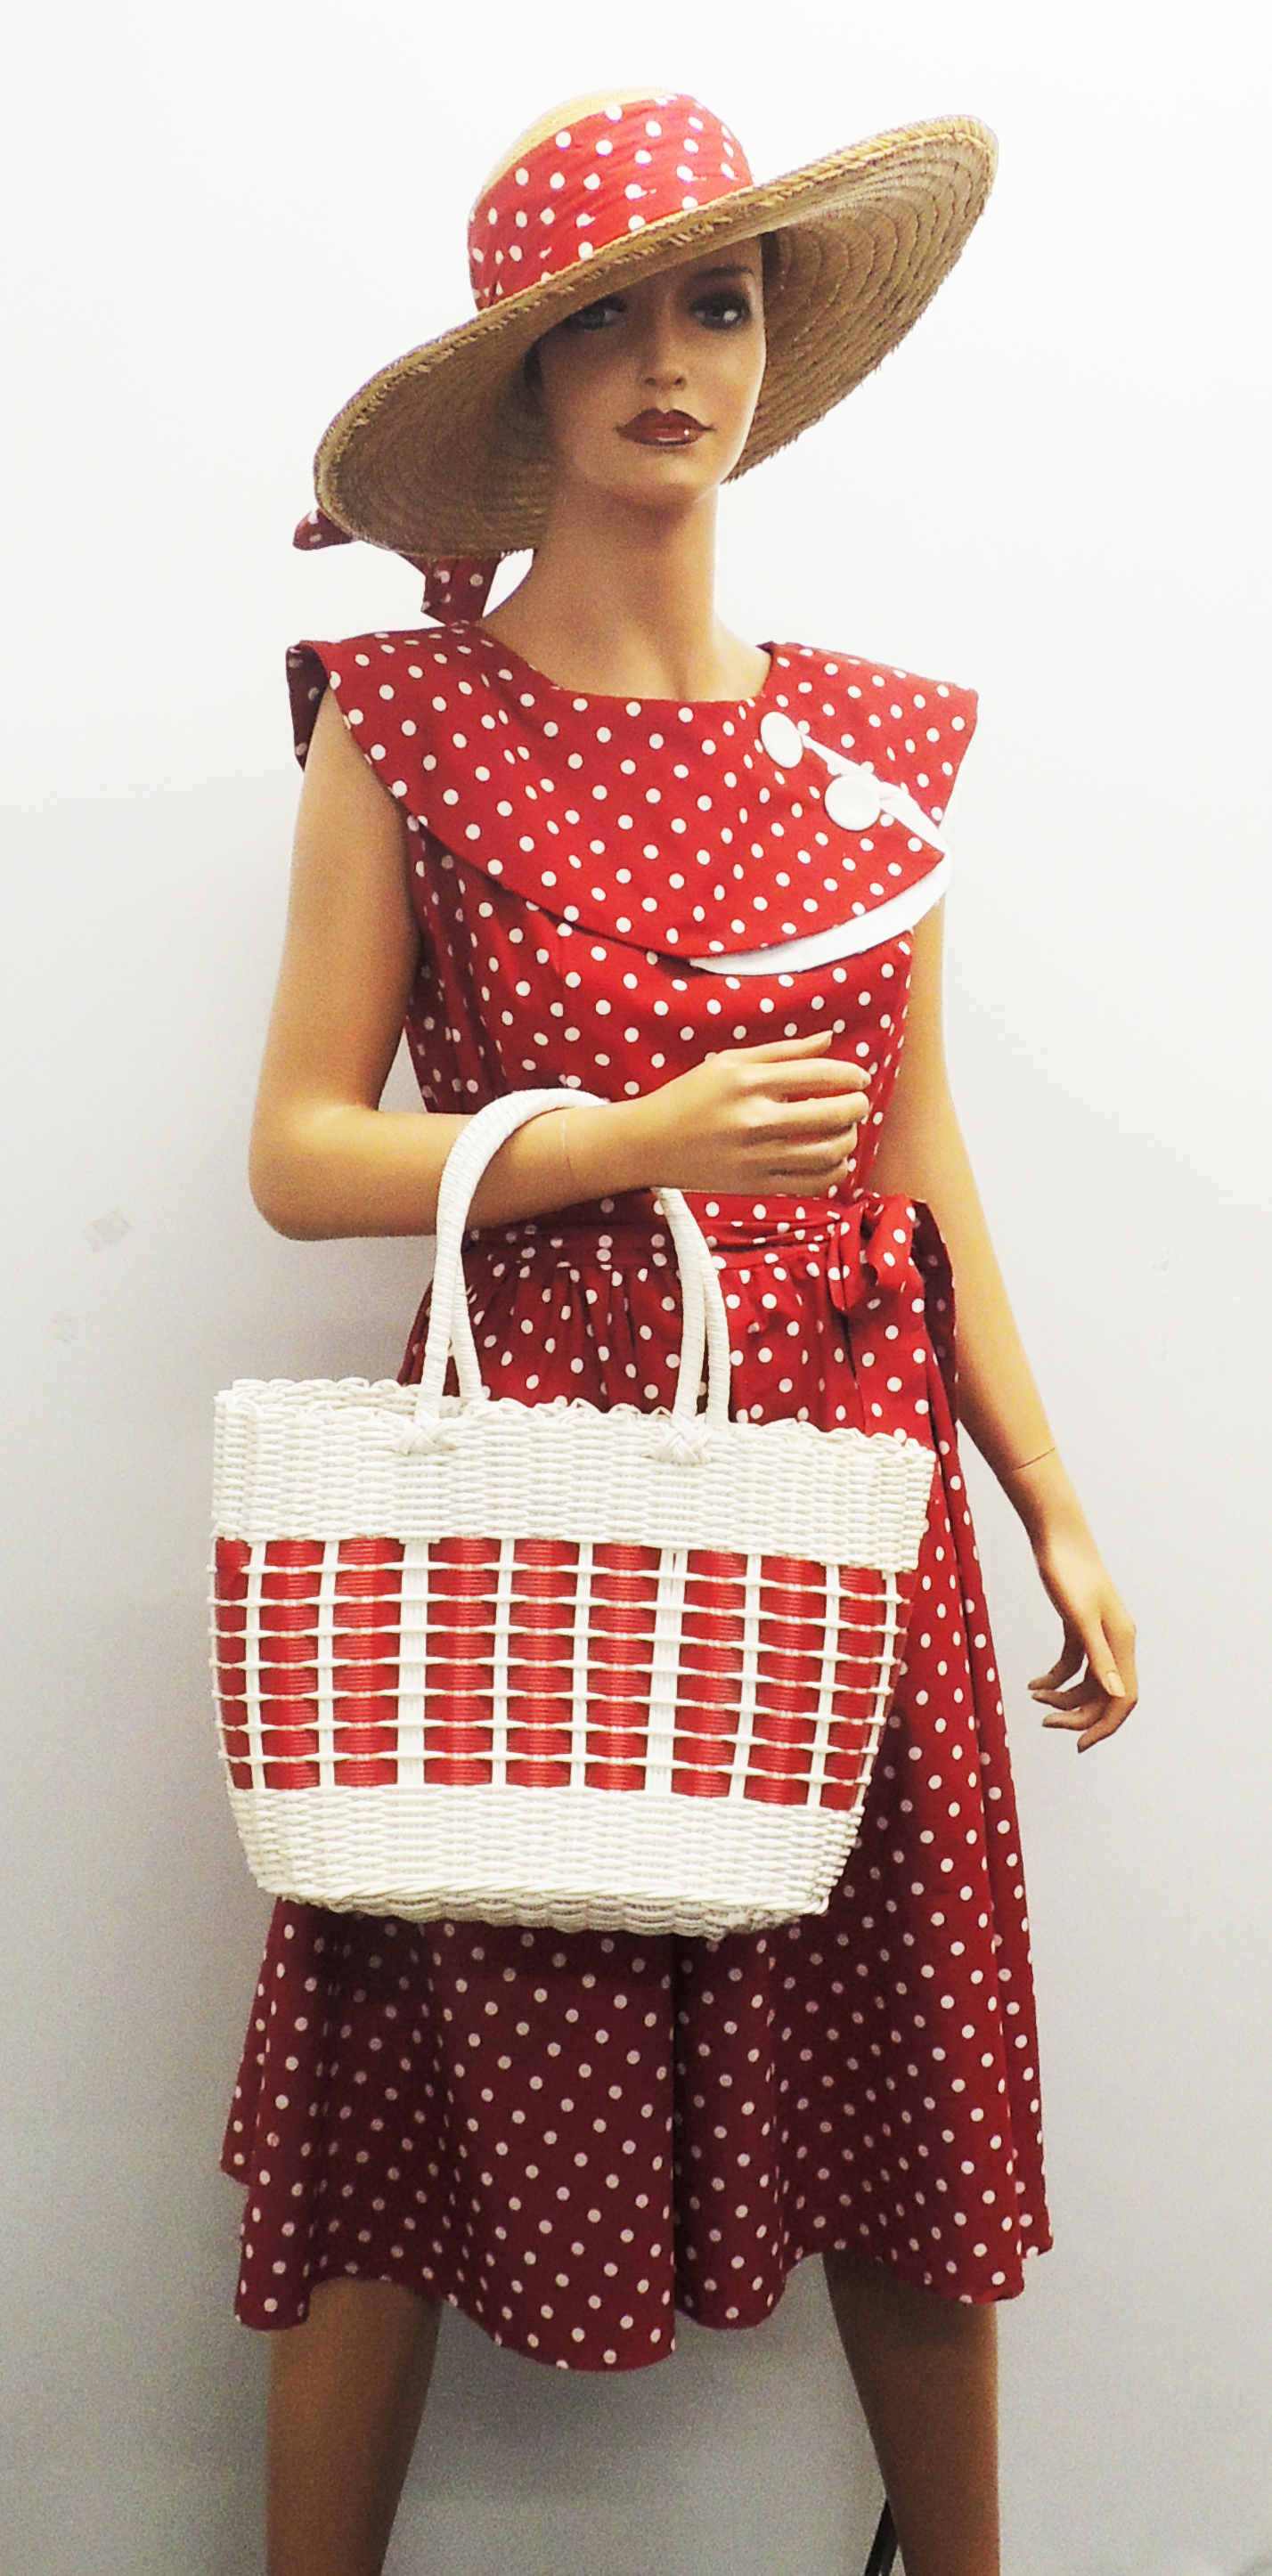 Retro Handbags, Purses, Wallets, Bags   New Retro 1940s 50's style White Red Blue Plastic Beach Picnic Shopping Basket $12.99 AT vintagedancer.com